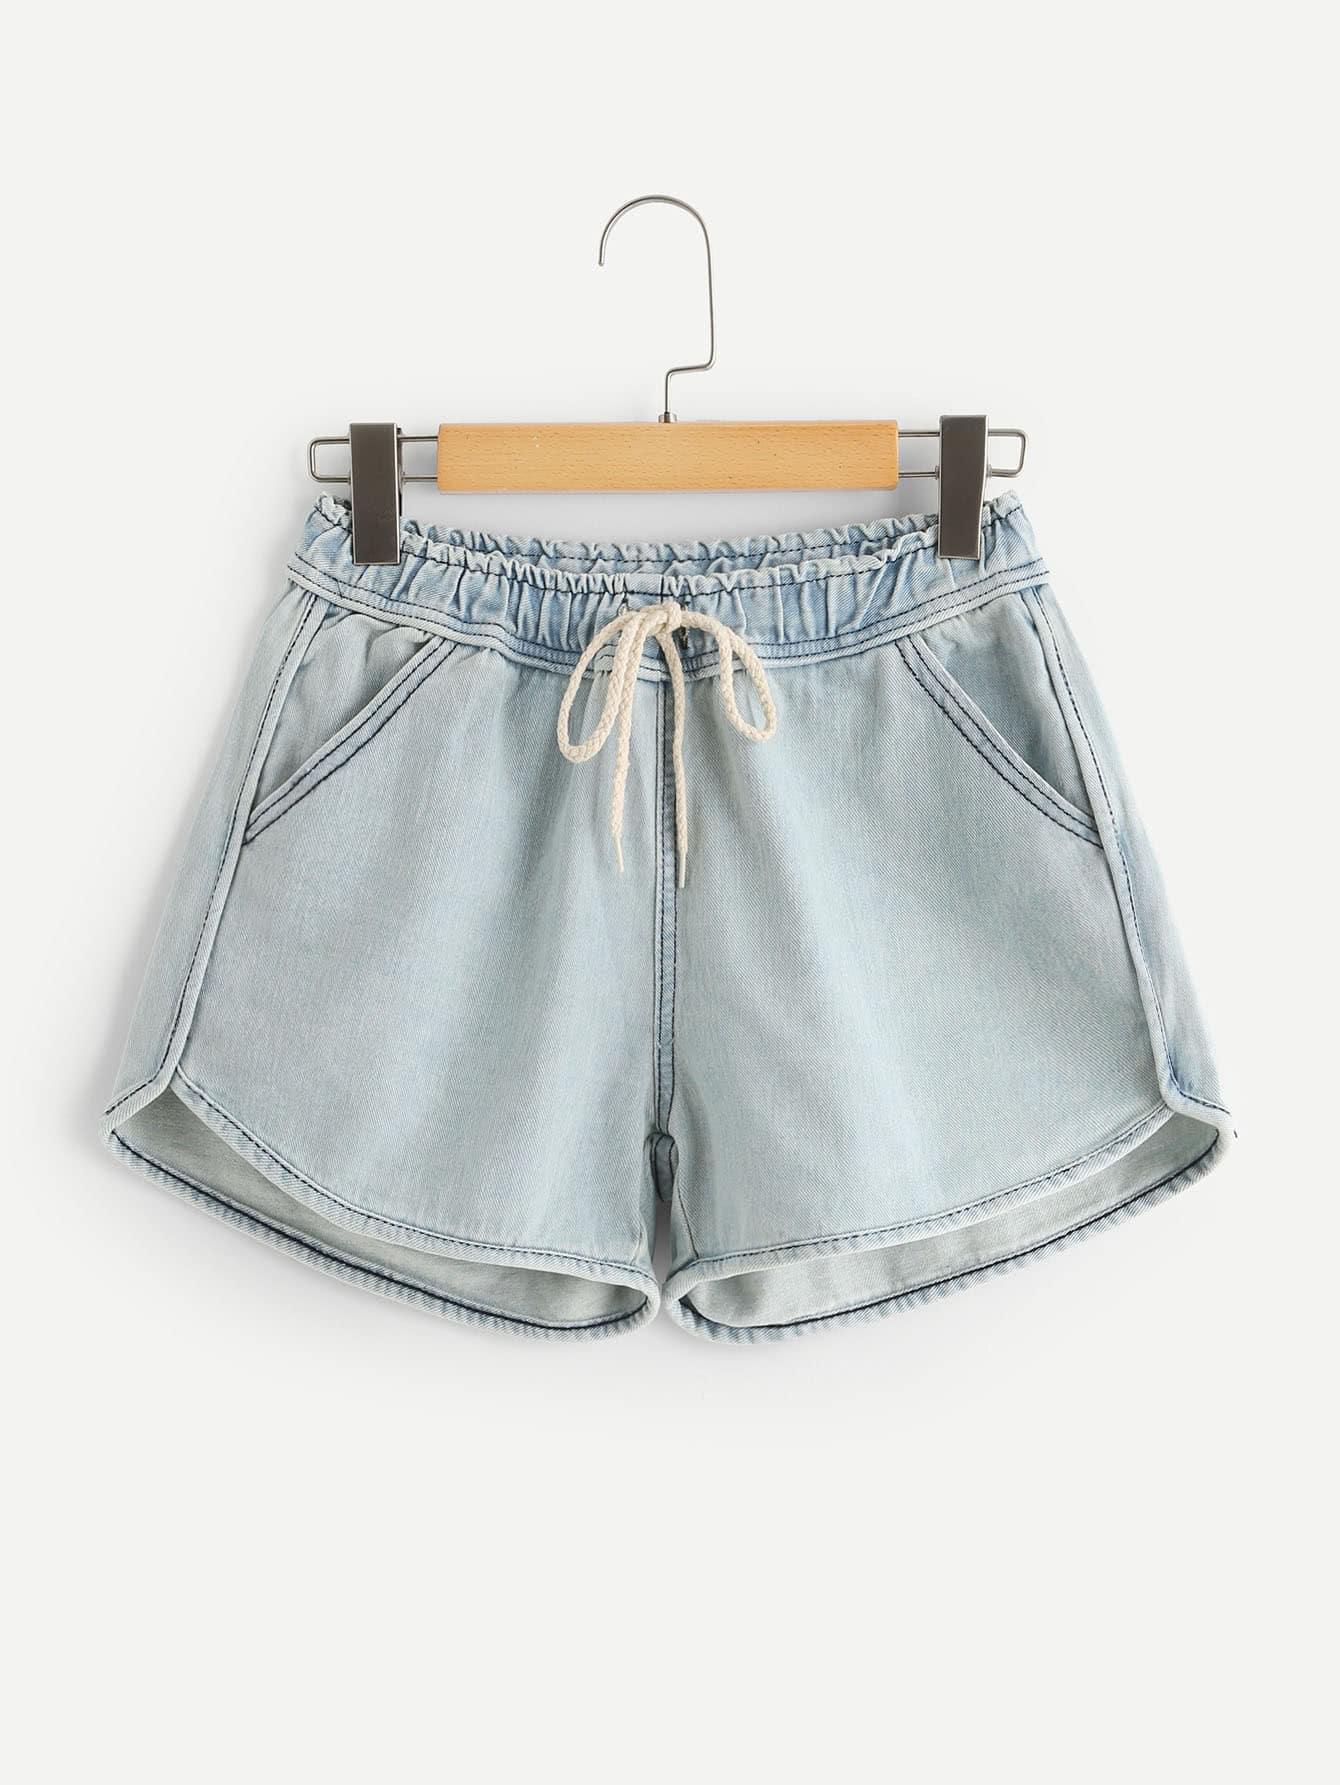 Bleach Wash Drawstring Waist Denim Shorts stylish women s lace embellised bleach wash denim shorts